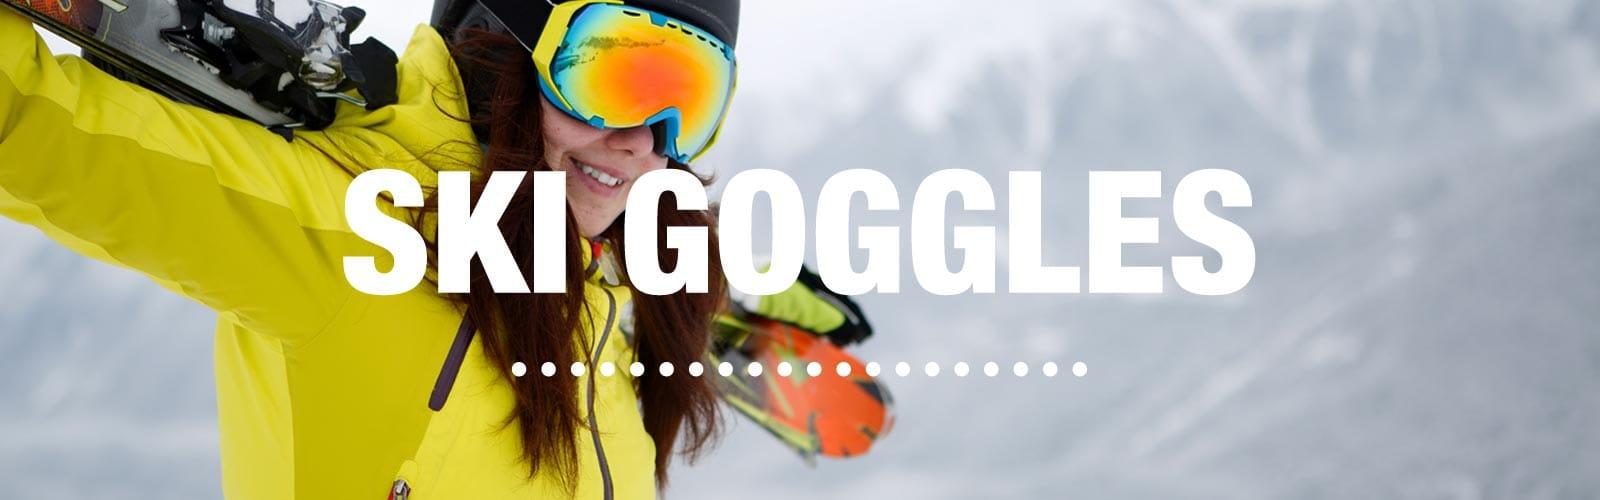 78dd6aee535 The Ski Goggles Guide  Sierra